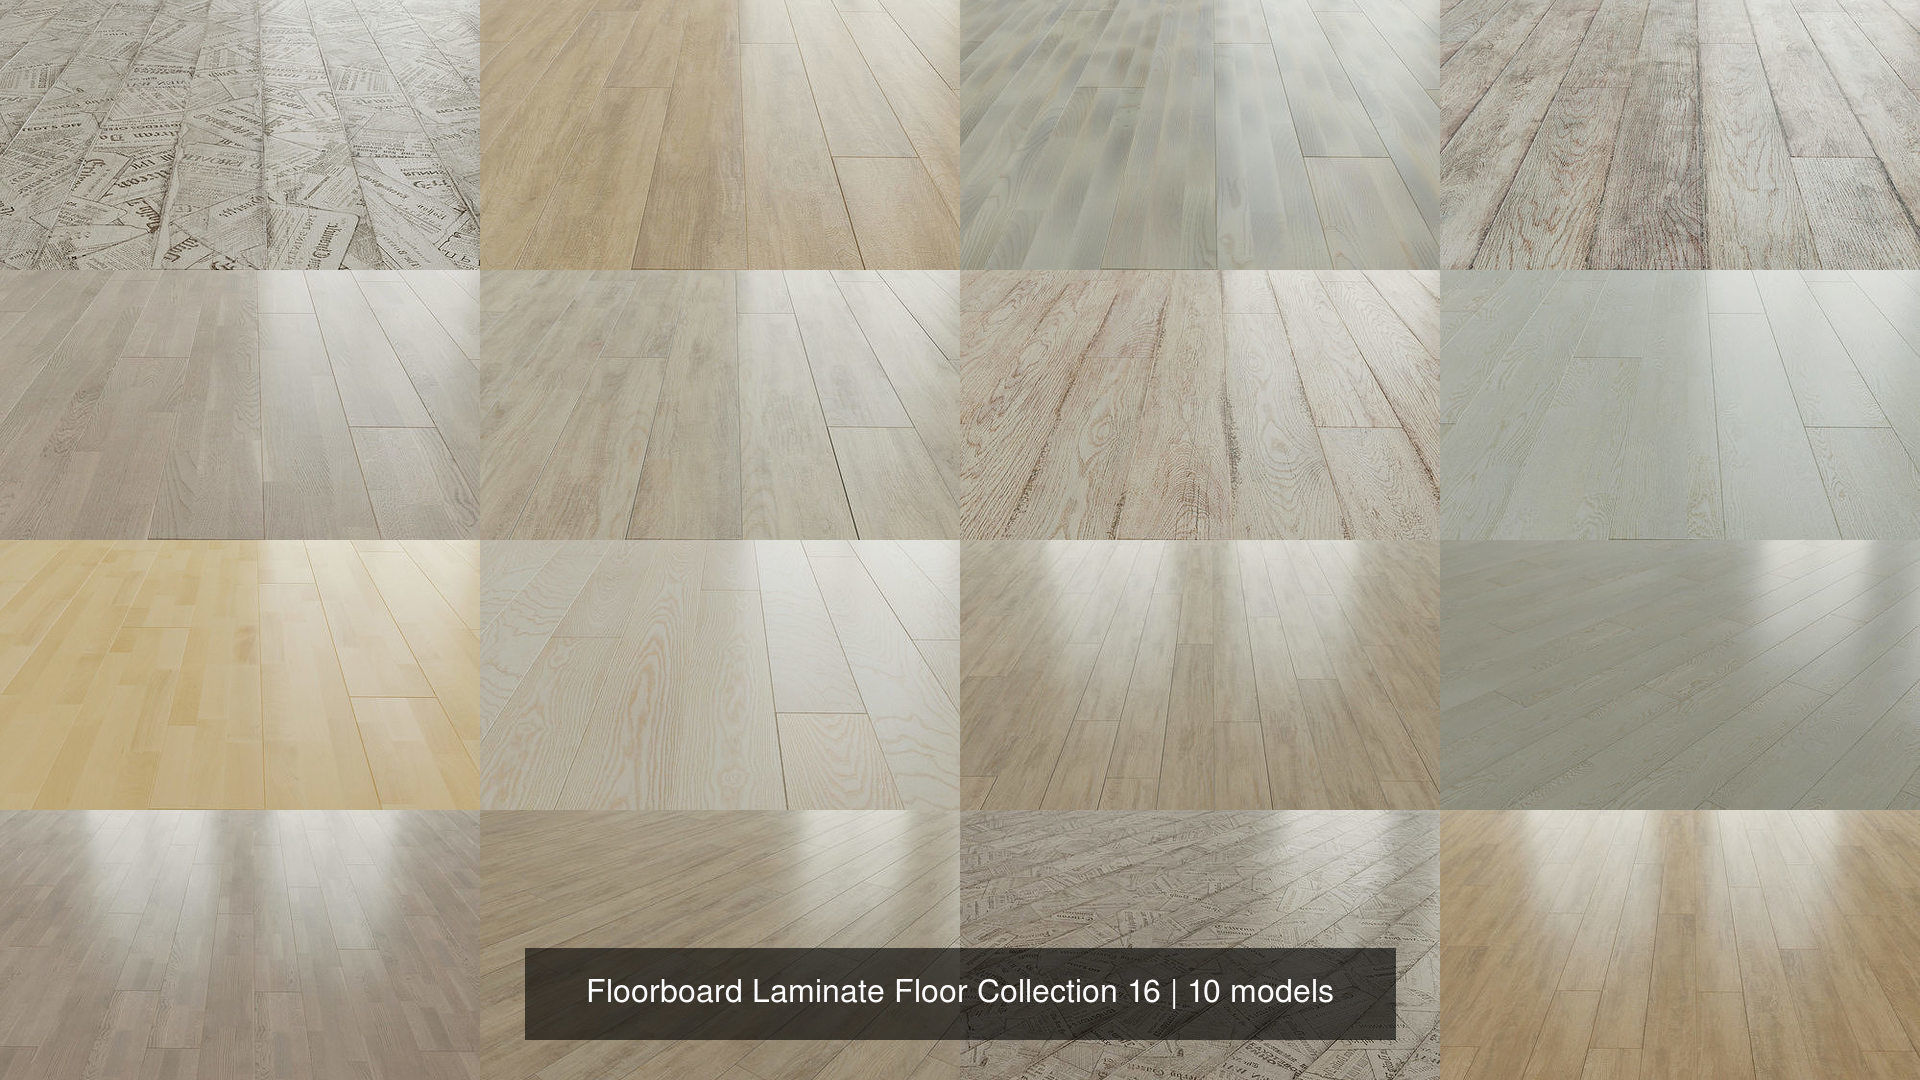 3d Floorboard Laminate Floor Collection, 3d Printed Laminate Flooring